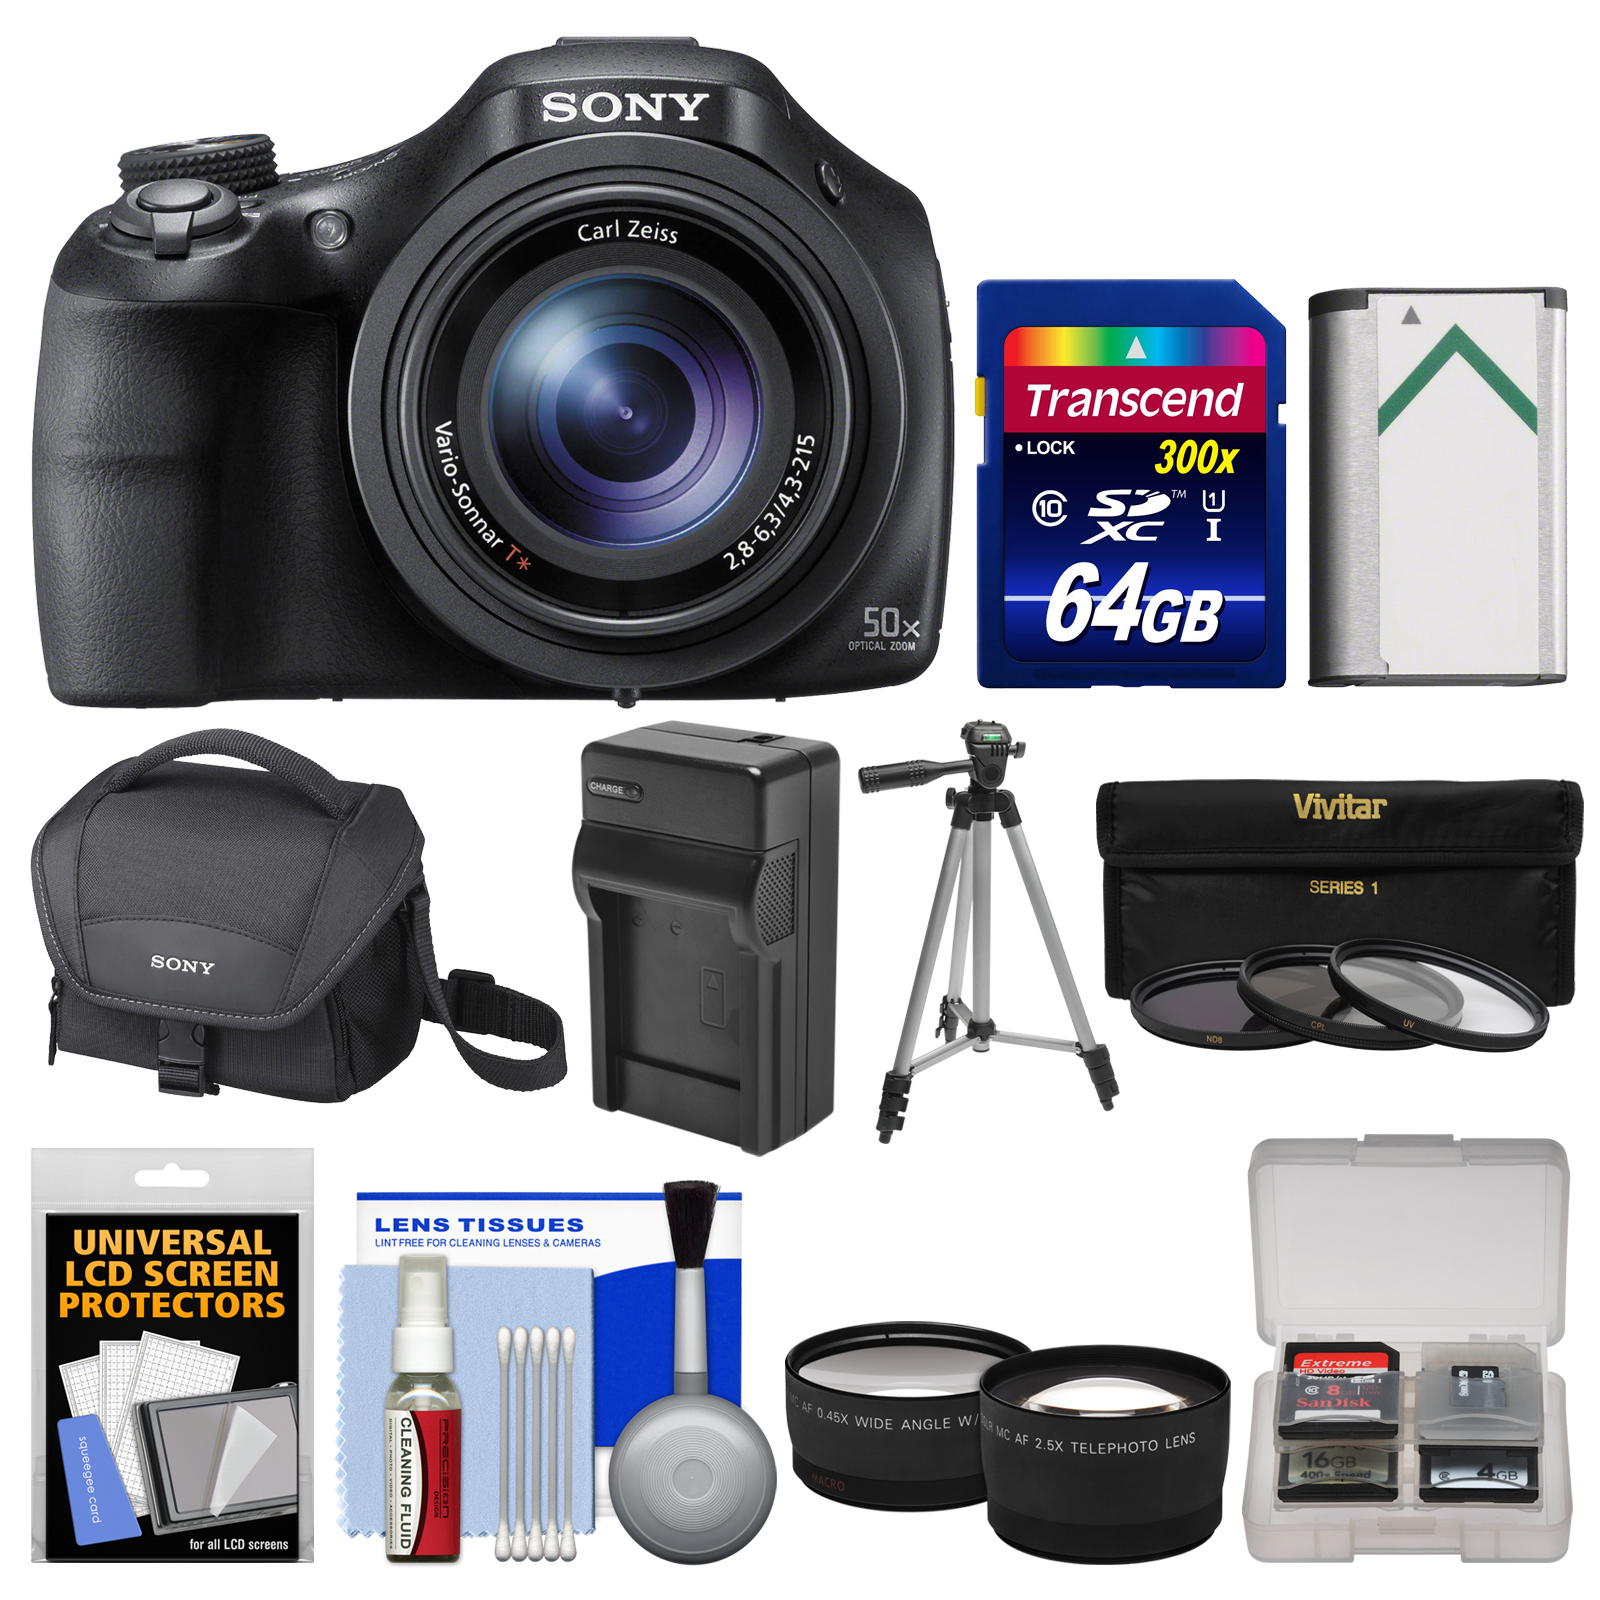 Sony Cyber Shot Dsc Hx400v Wi Fi Digital Camera With 64gb